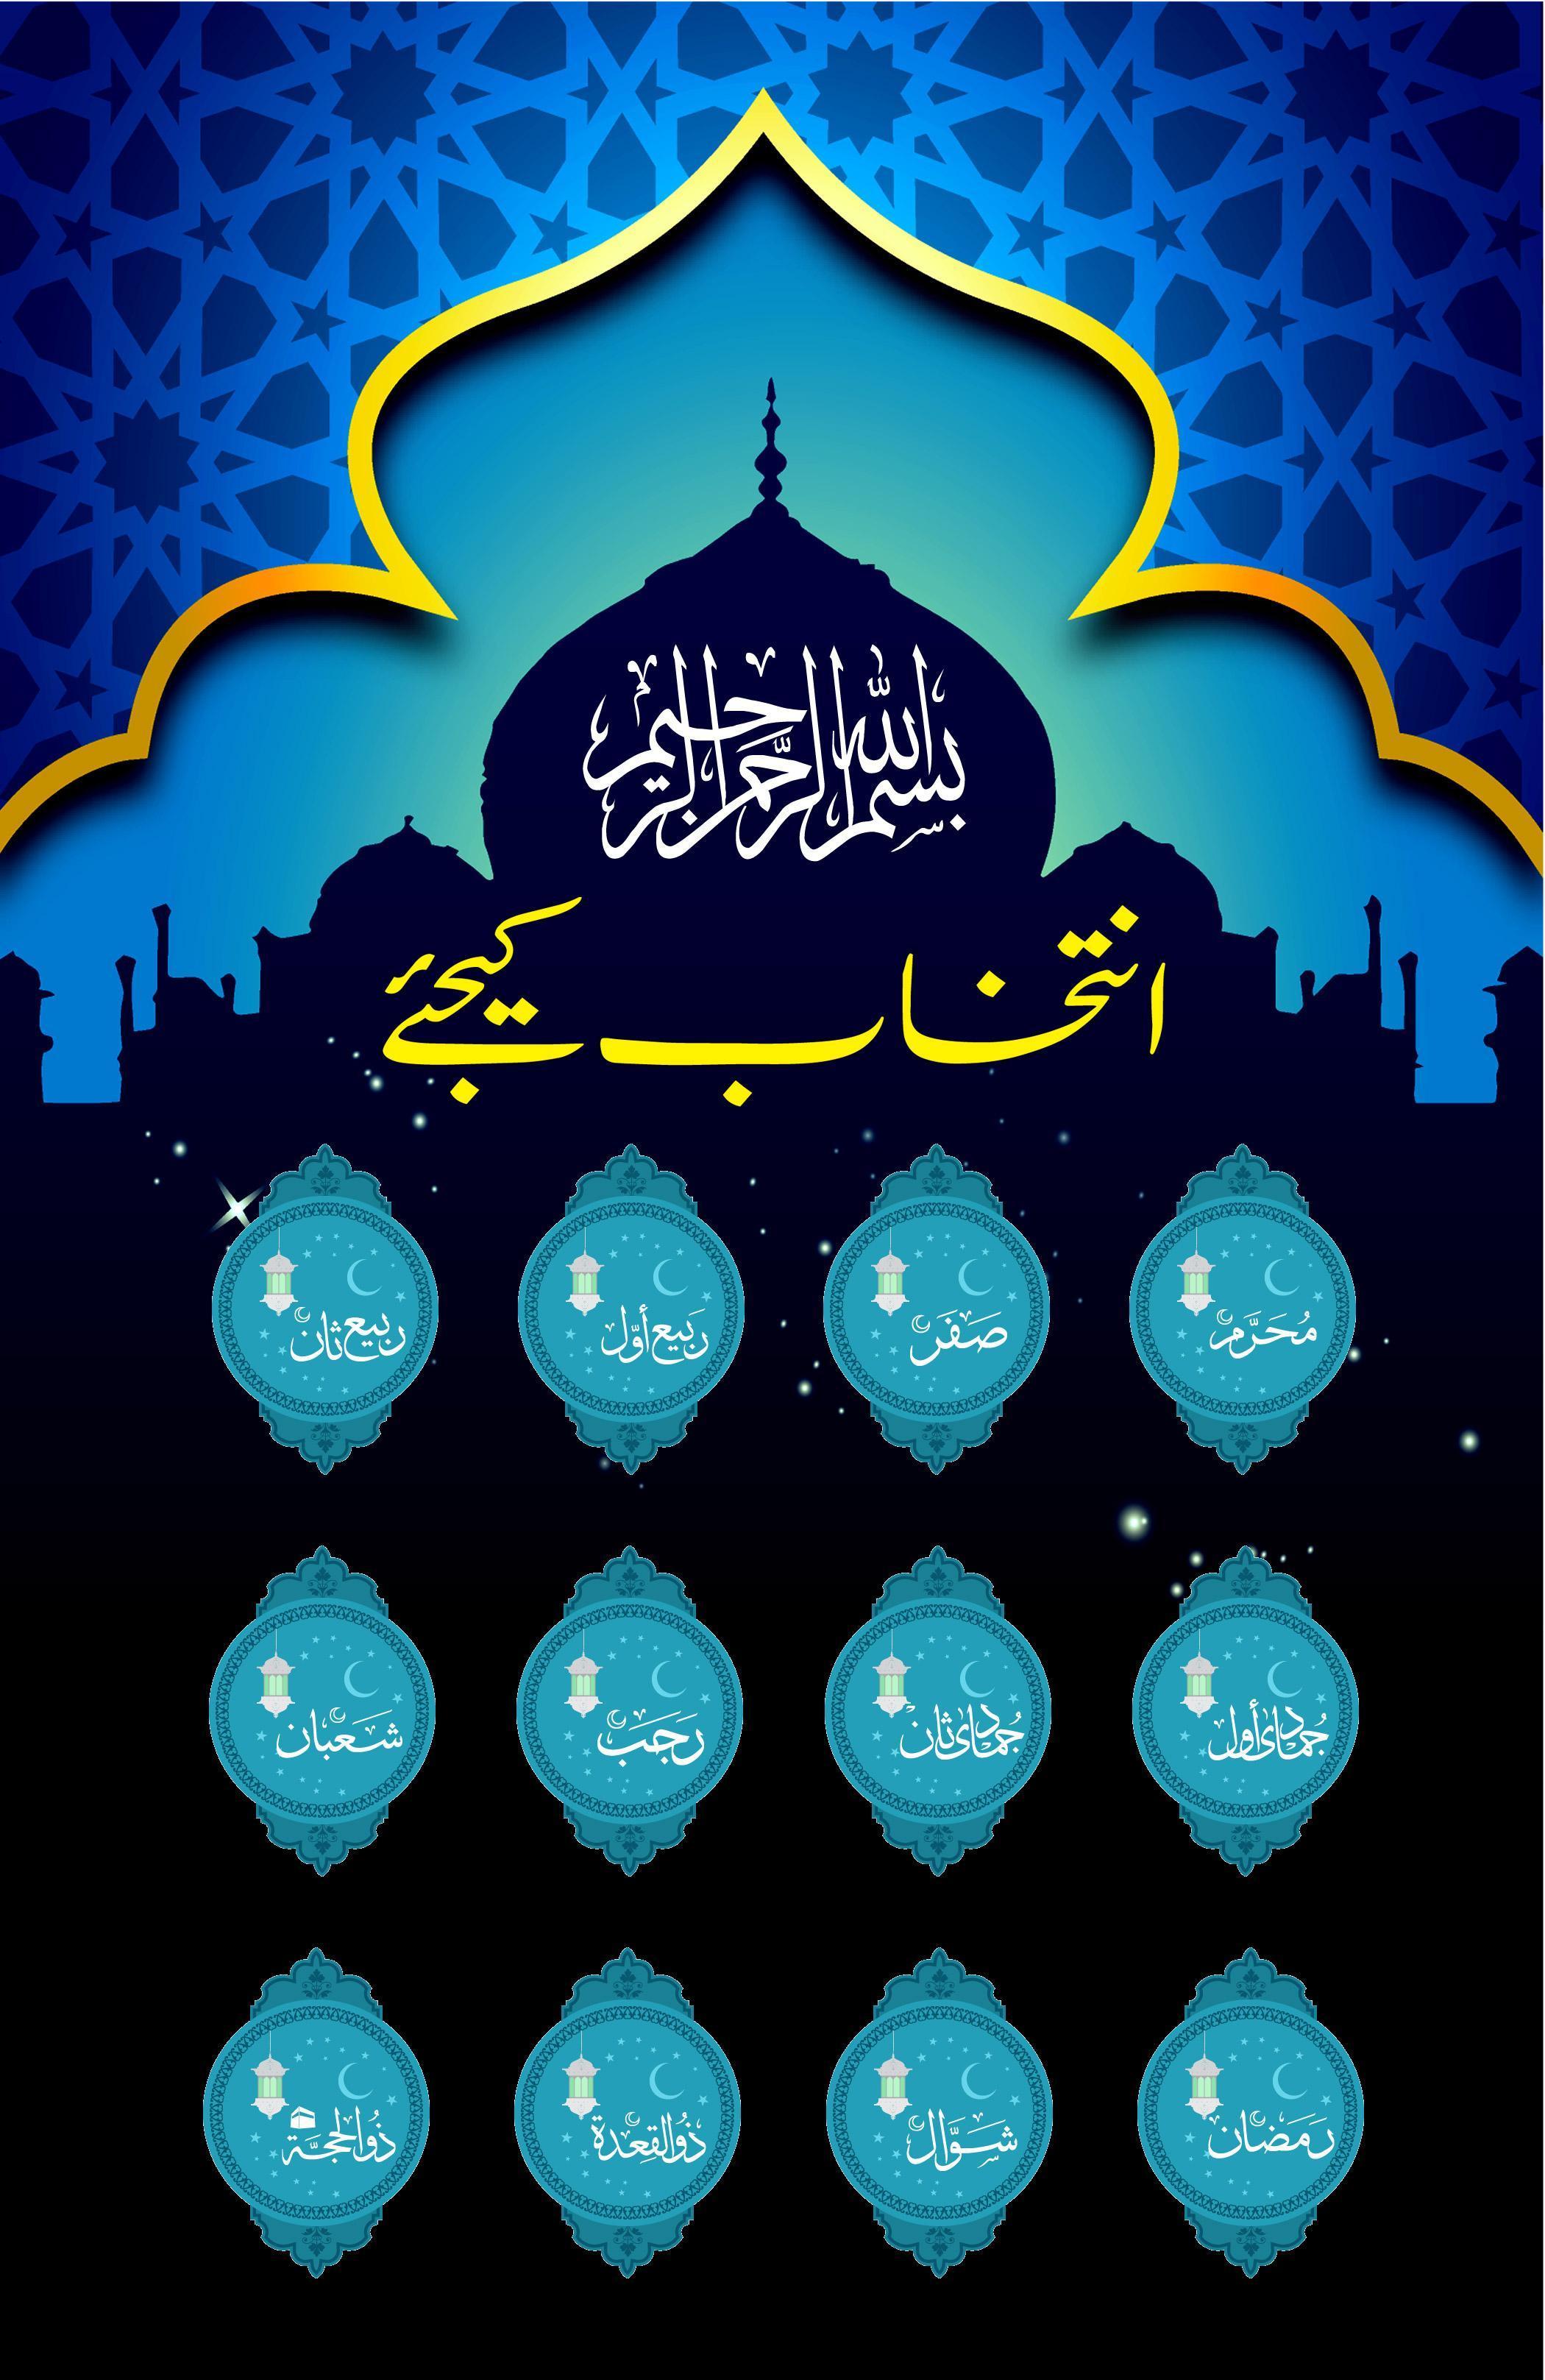 Khutbat-e-Mawaiz-e-Jummah for Android - APK Download